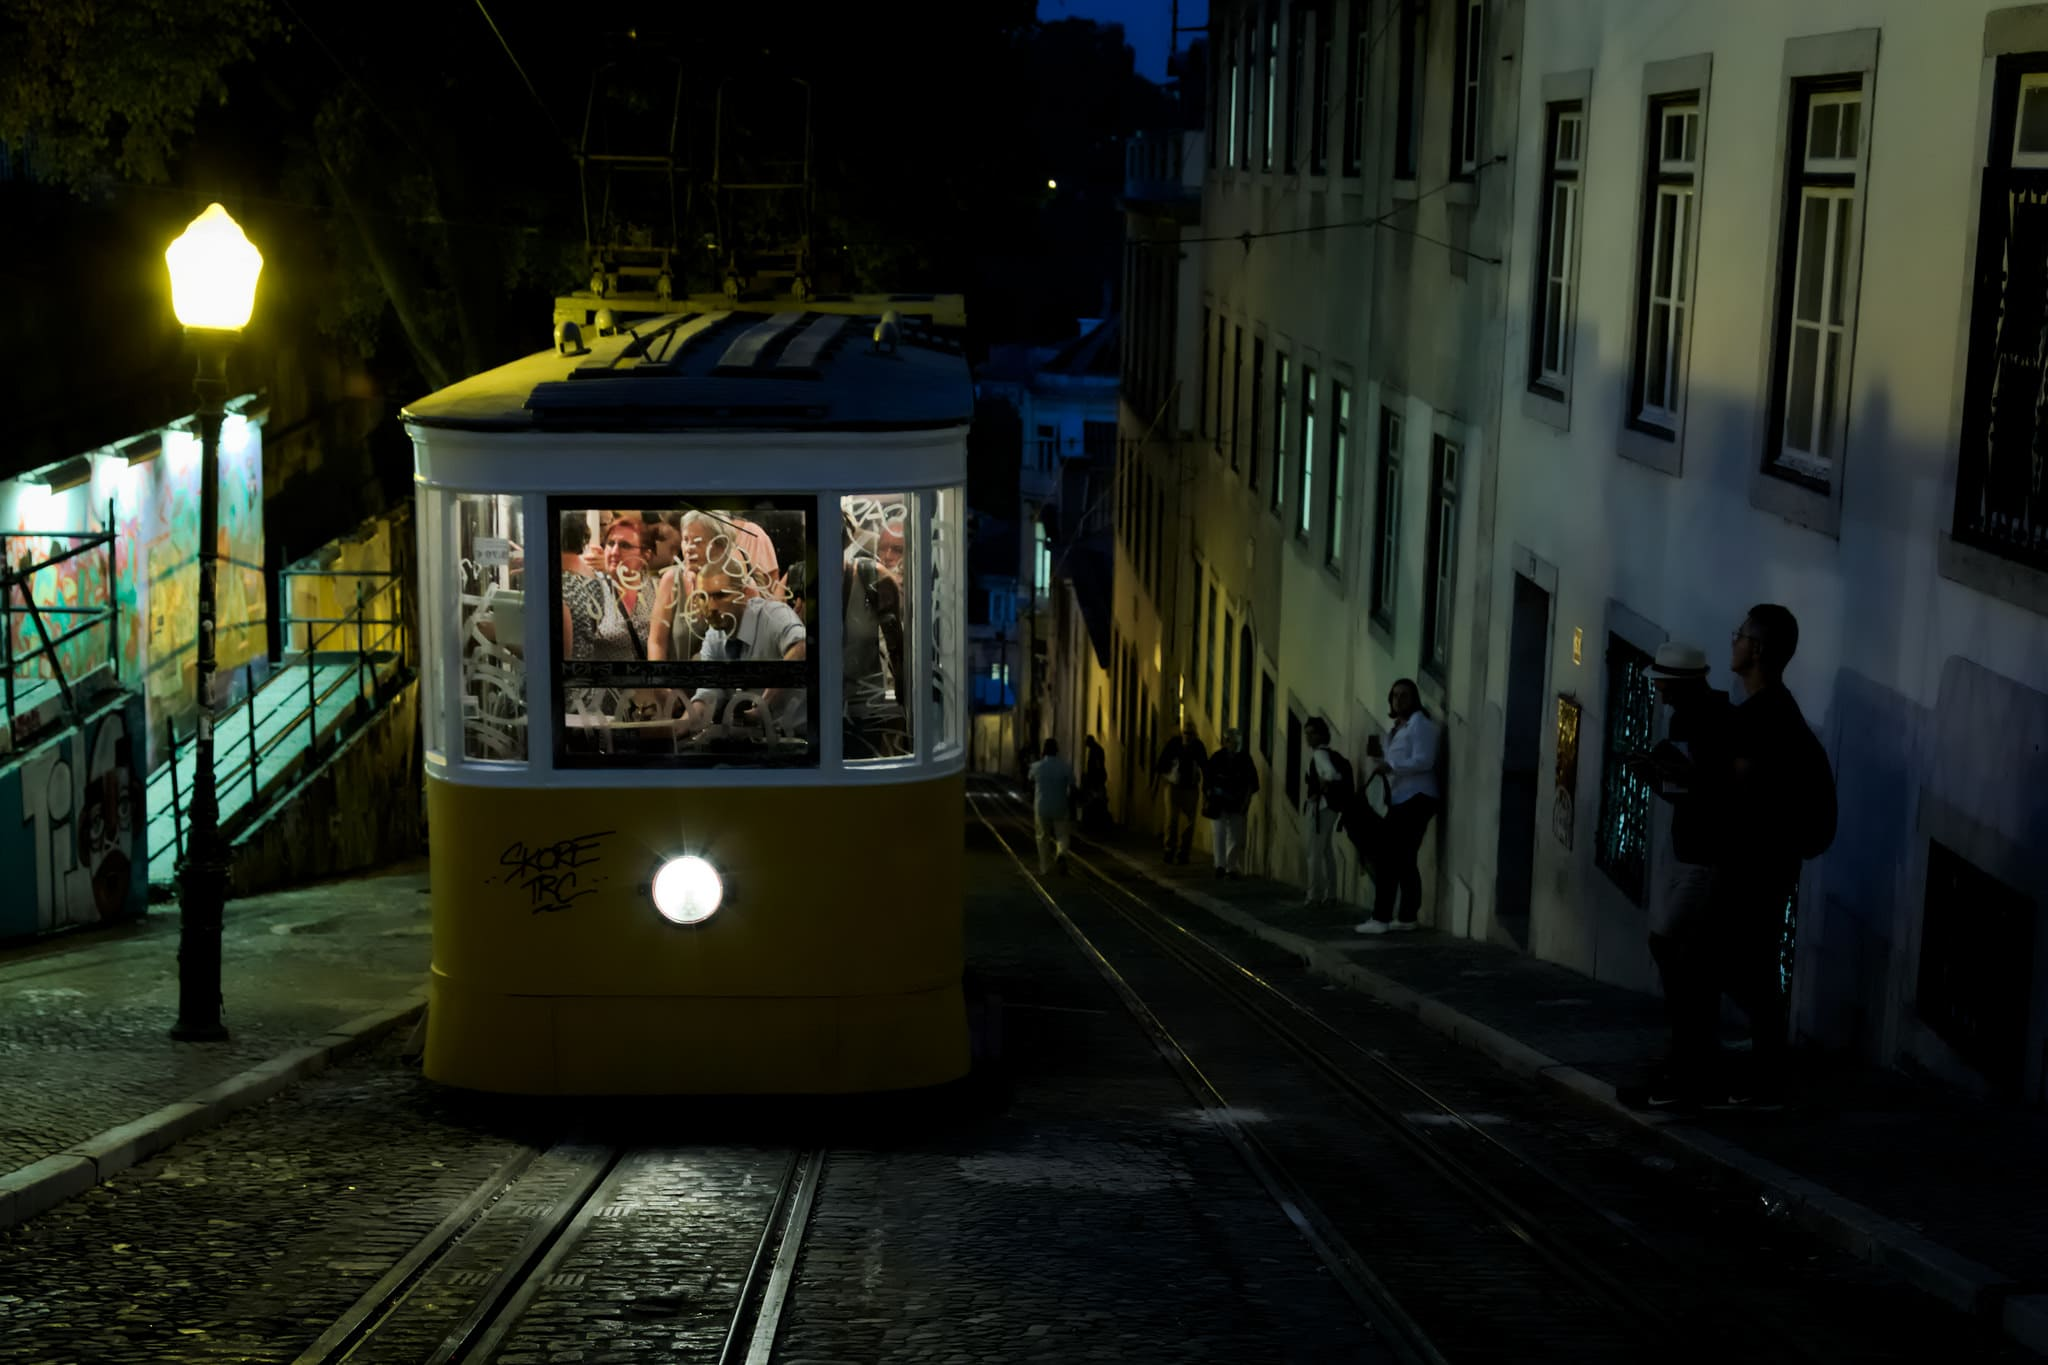 Lisbona tradizionale